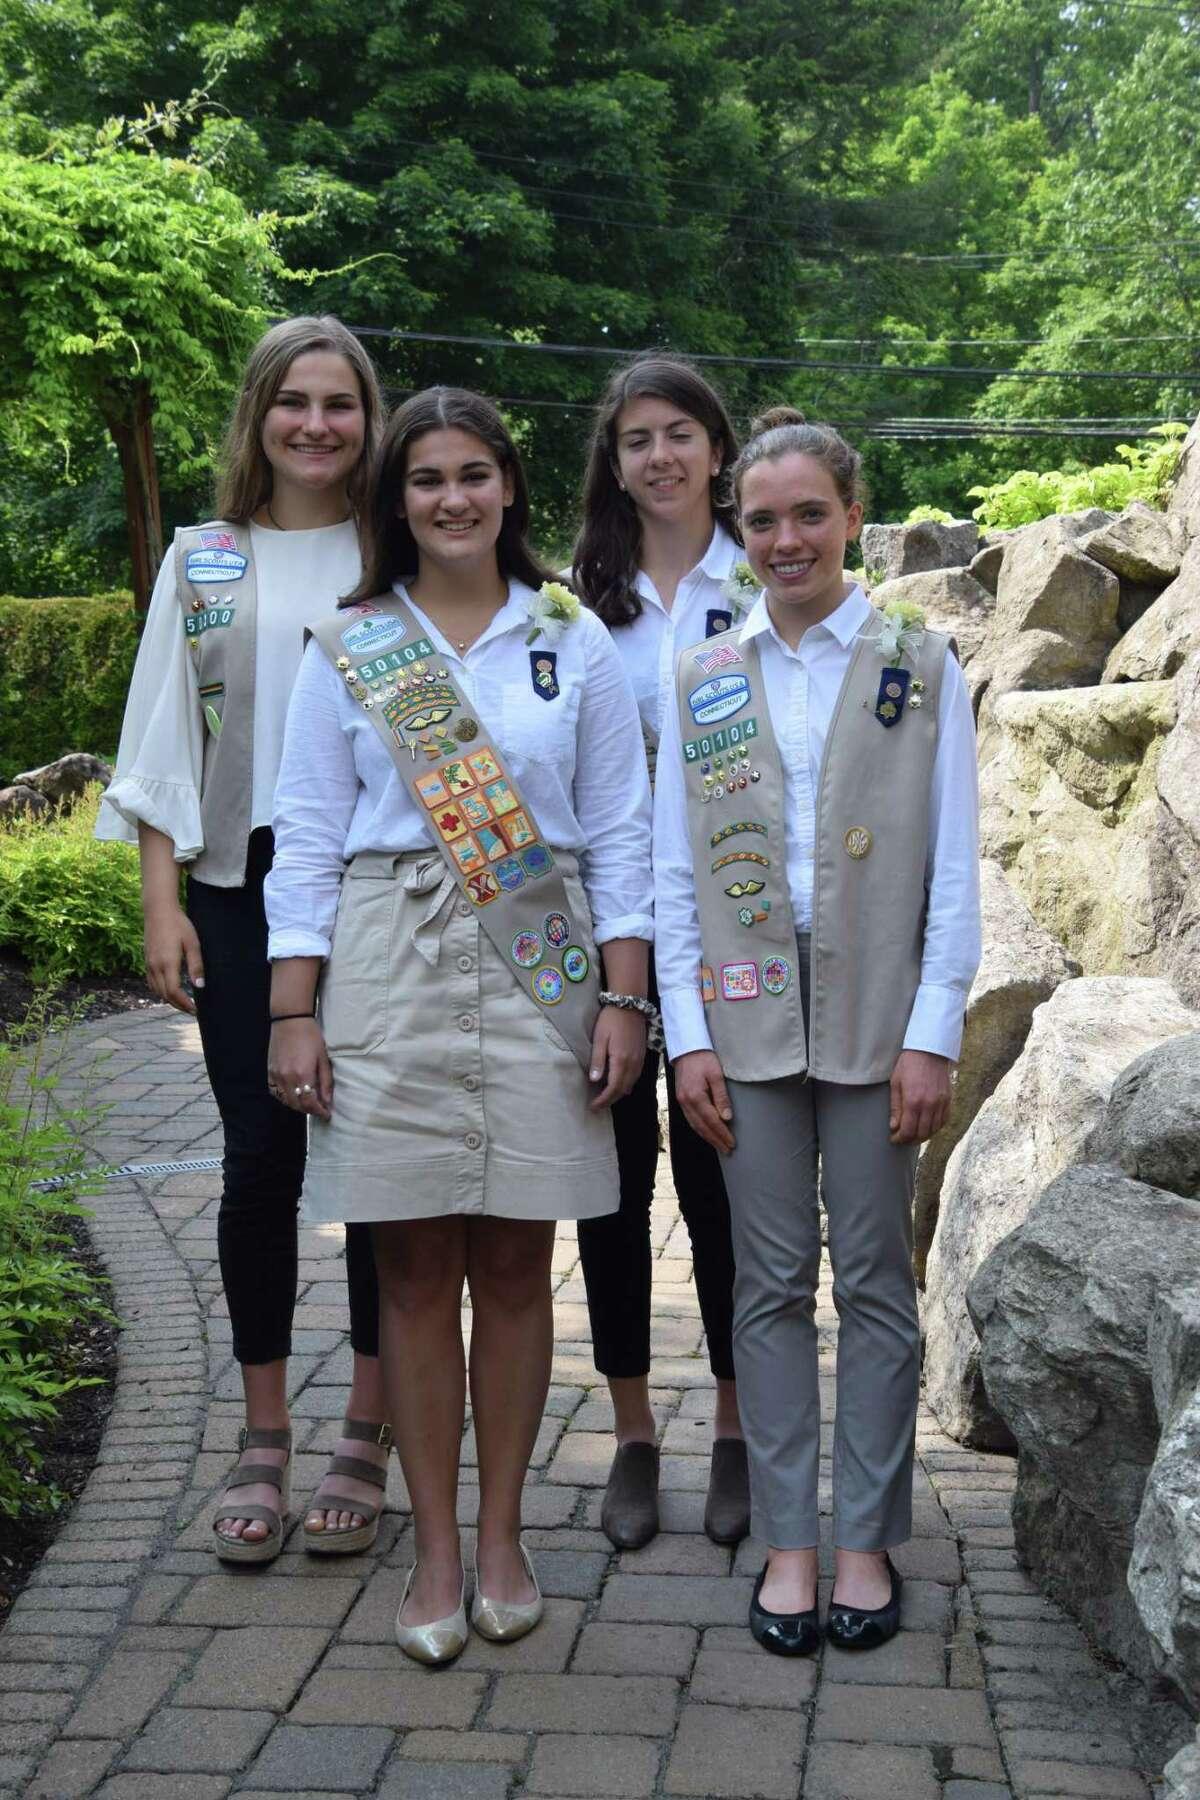 Anna Meurer, Madelyn Yu, Abigail Lucier, Caroline Webb went to Hamden for a presentation of Girl Scout Gold Awards.